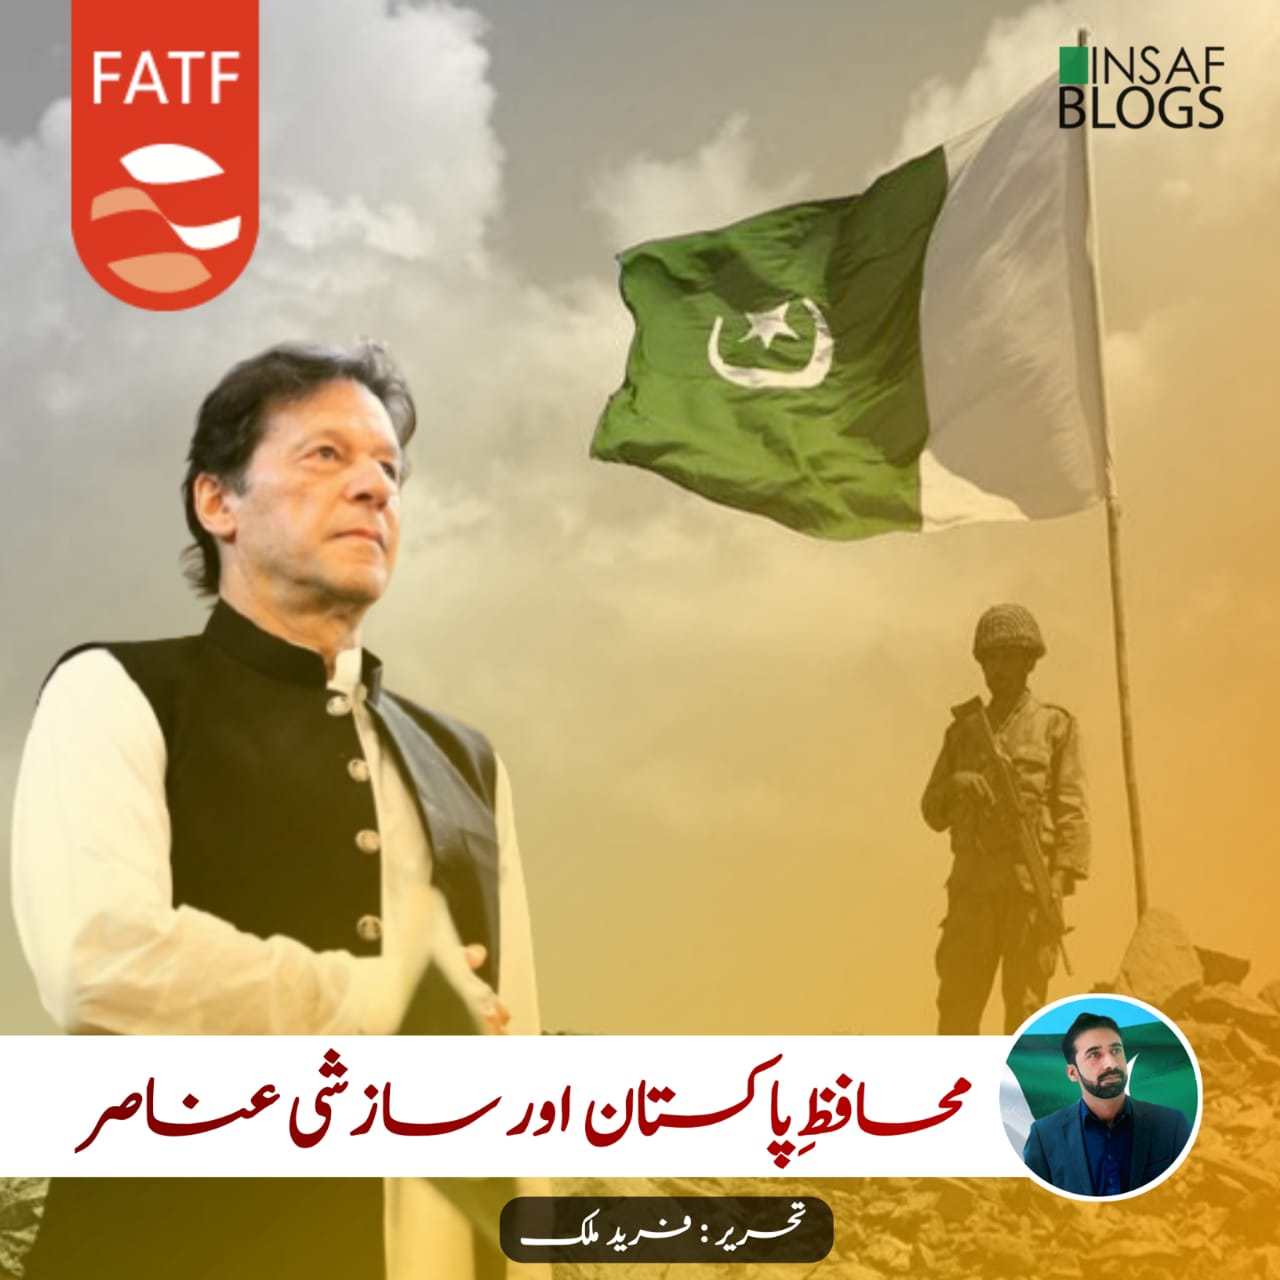 Mohafiz E Pakistan Aur Saazishi Anaasir - Insaf Blog